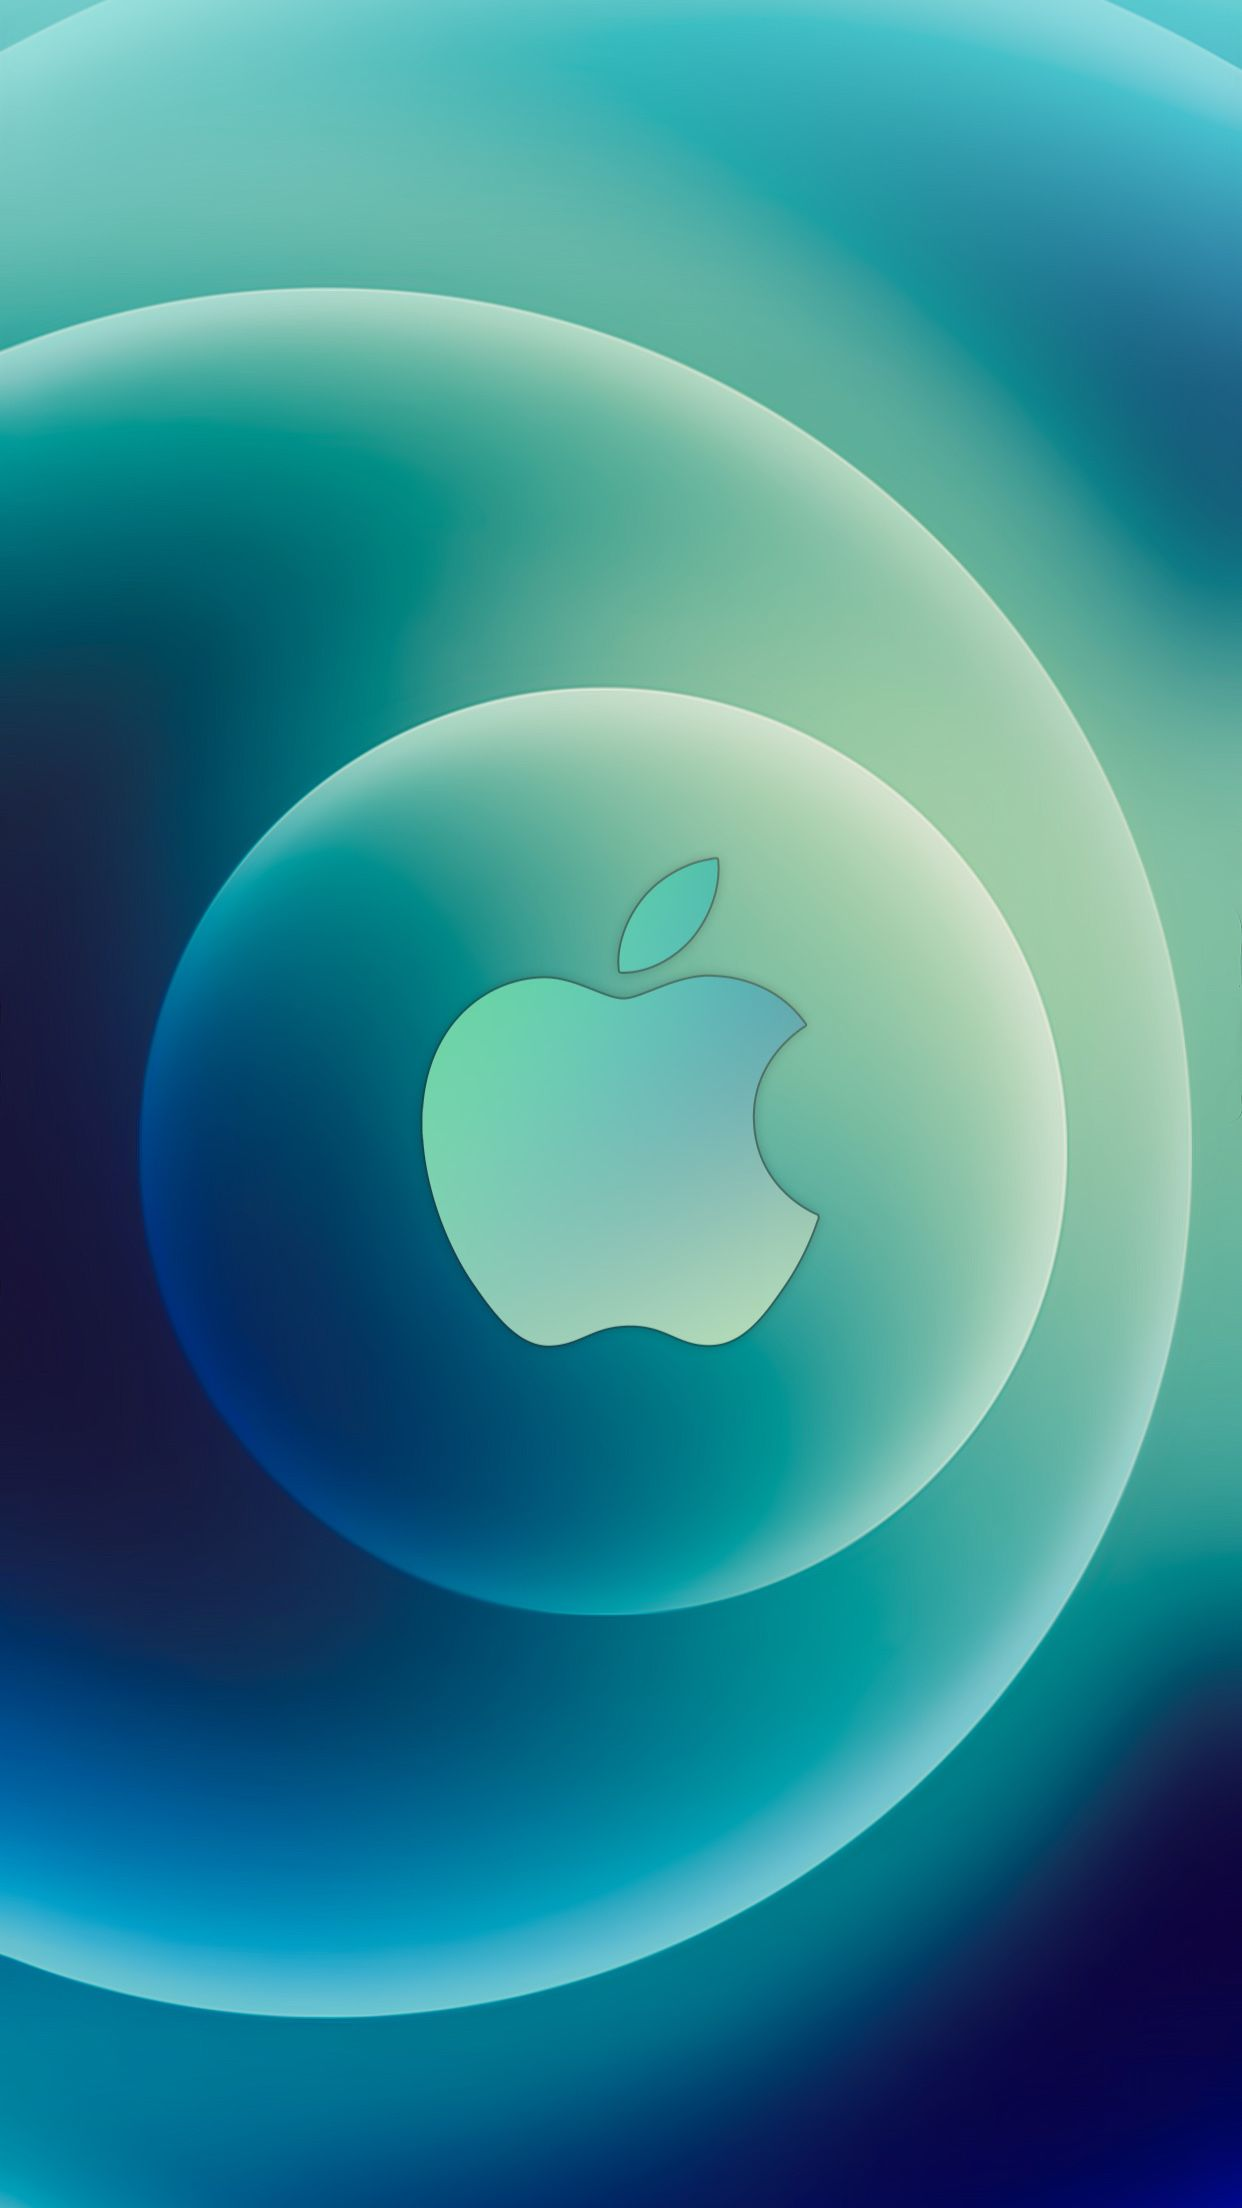 Apple Iphone 12 Logo Wallpaper Wallpaper Iphone Wallpaper Apel Wallpaper Iphone Hitam